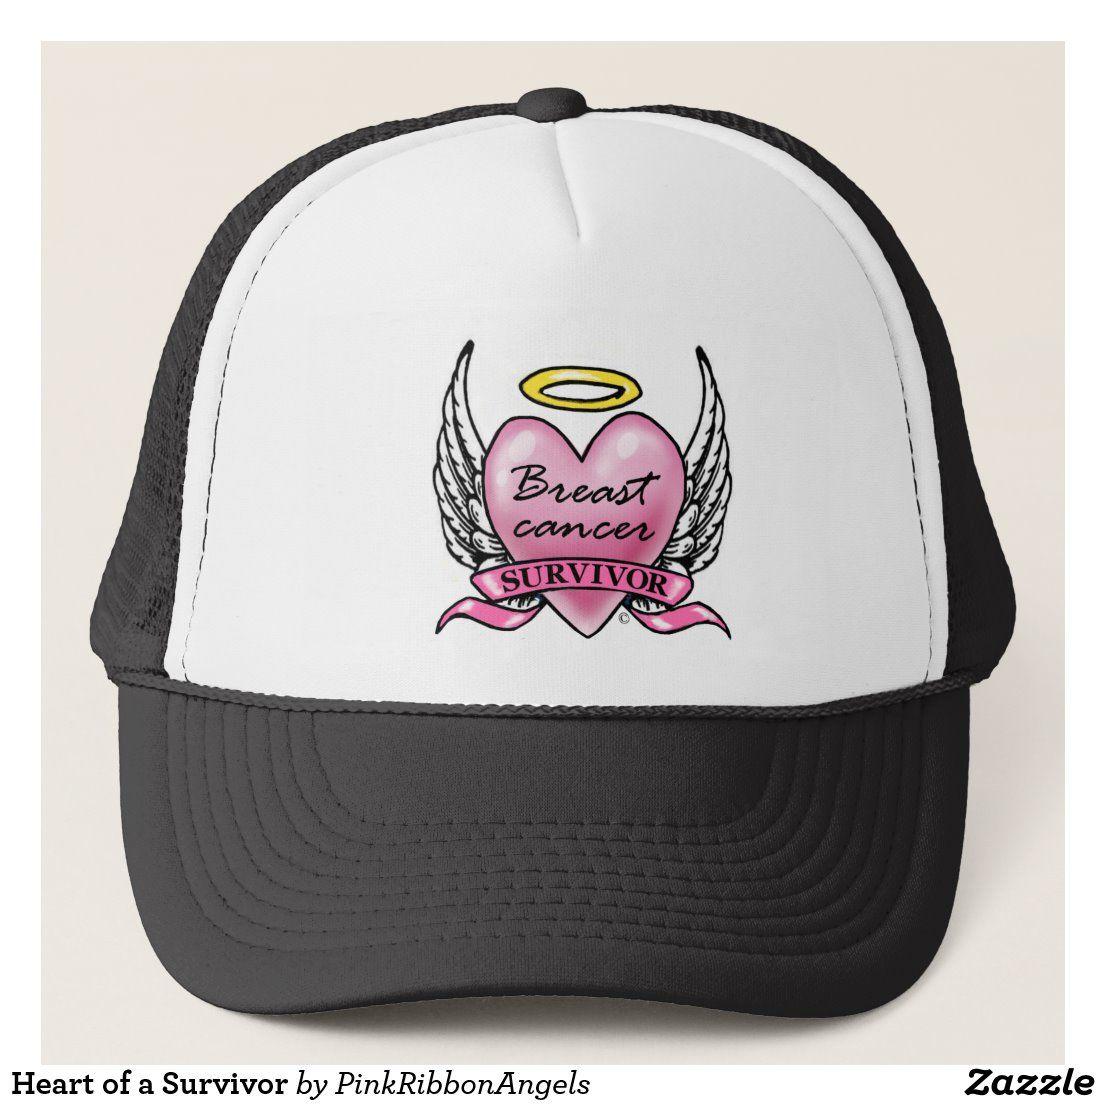 Heart of a survivor trucker hat in 2020